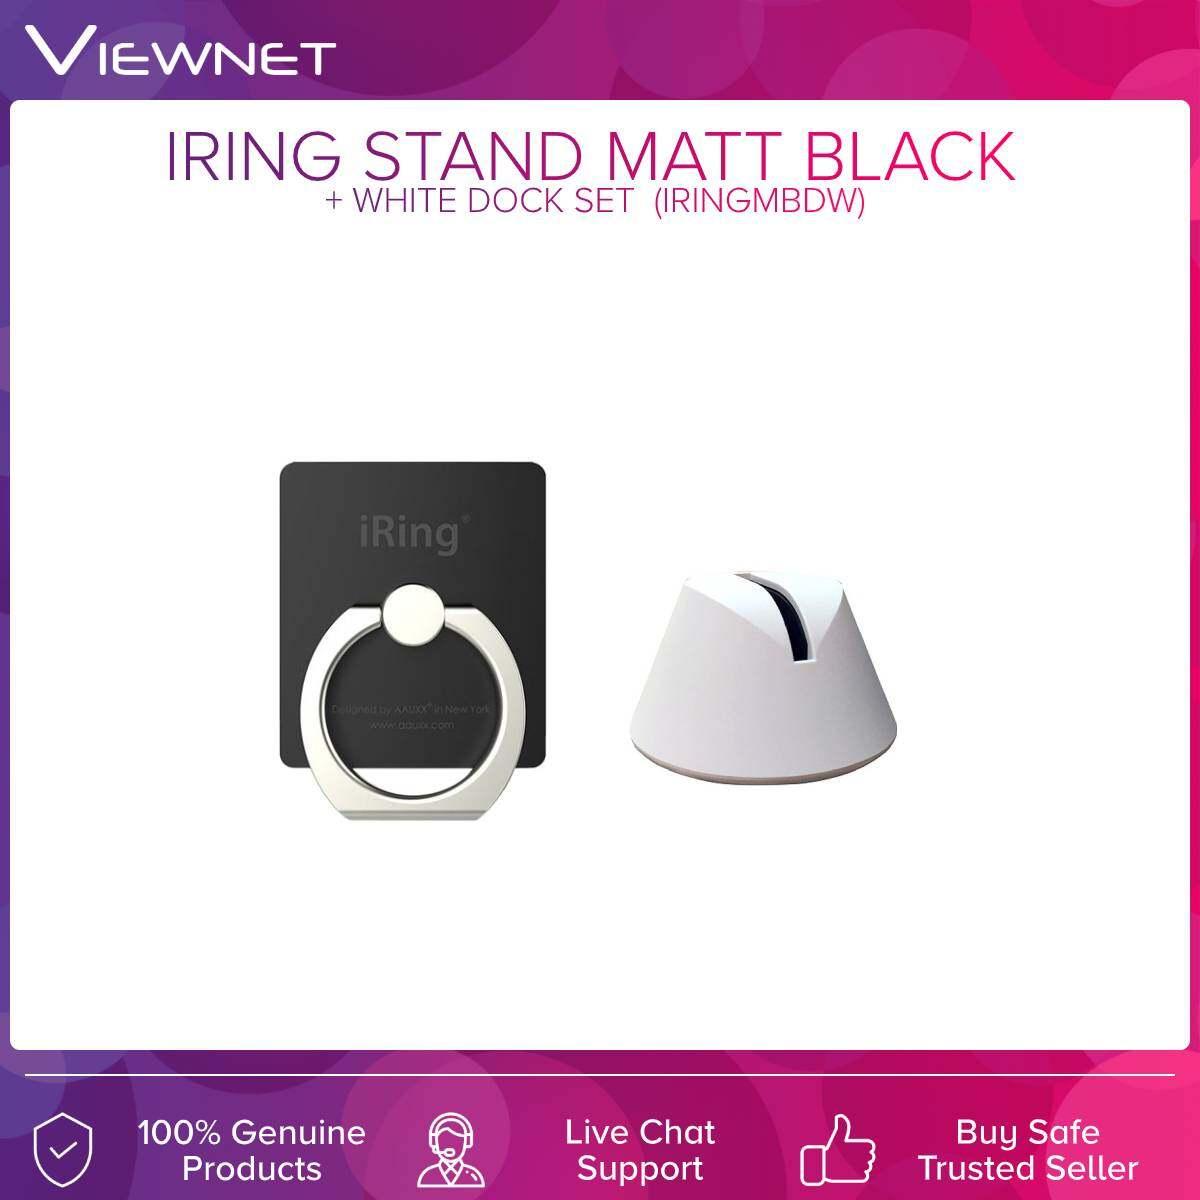 [Original] Iring 360 Degree Stand With White Dock / Black Dock Set